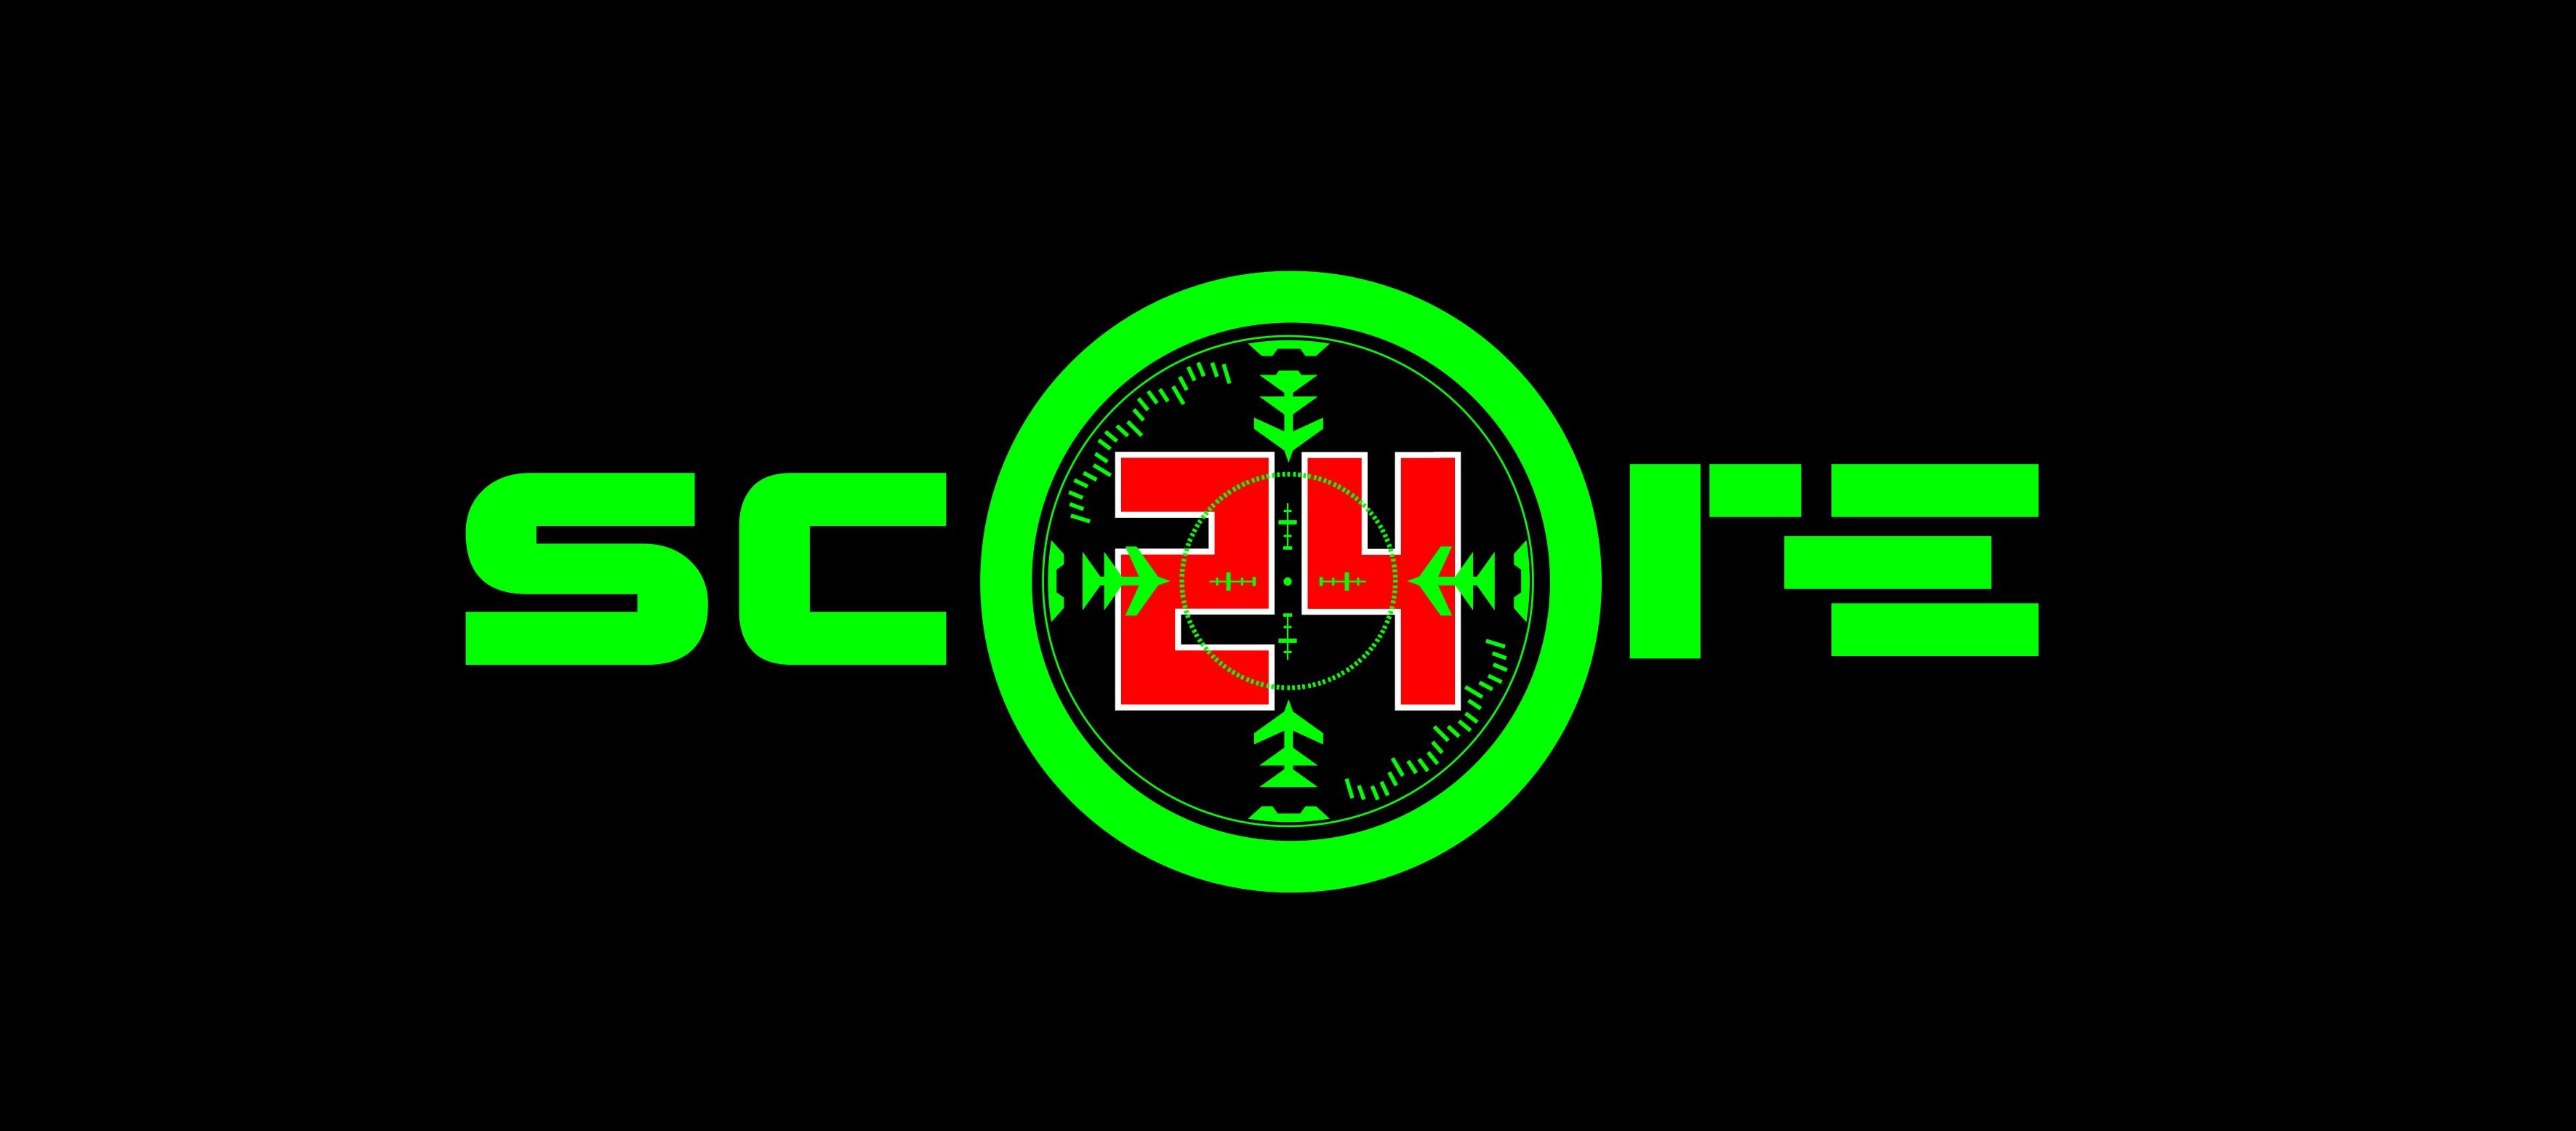 Разработка логотипа для бара! фото f_8425dcf0a688e619.jpg